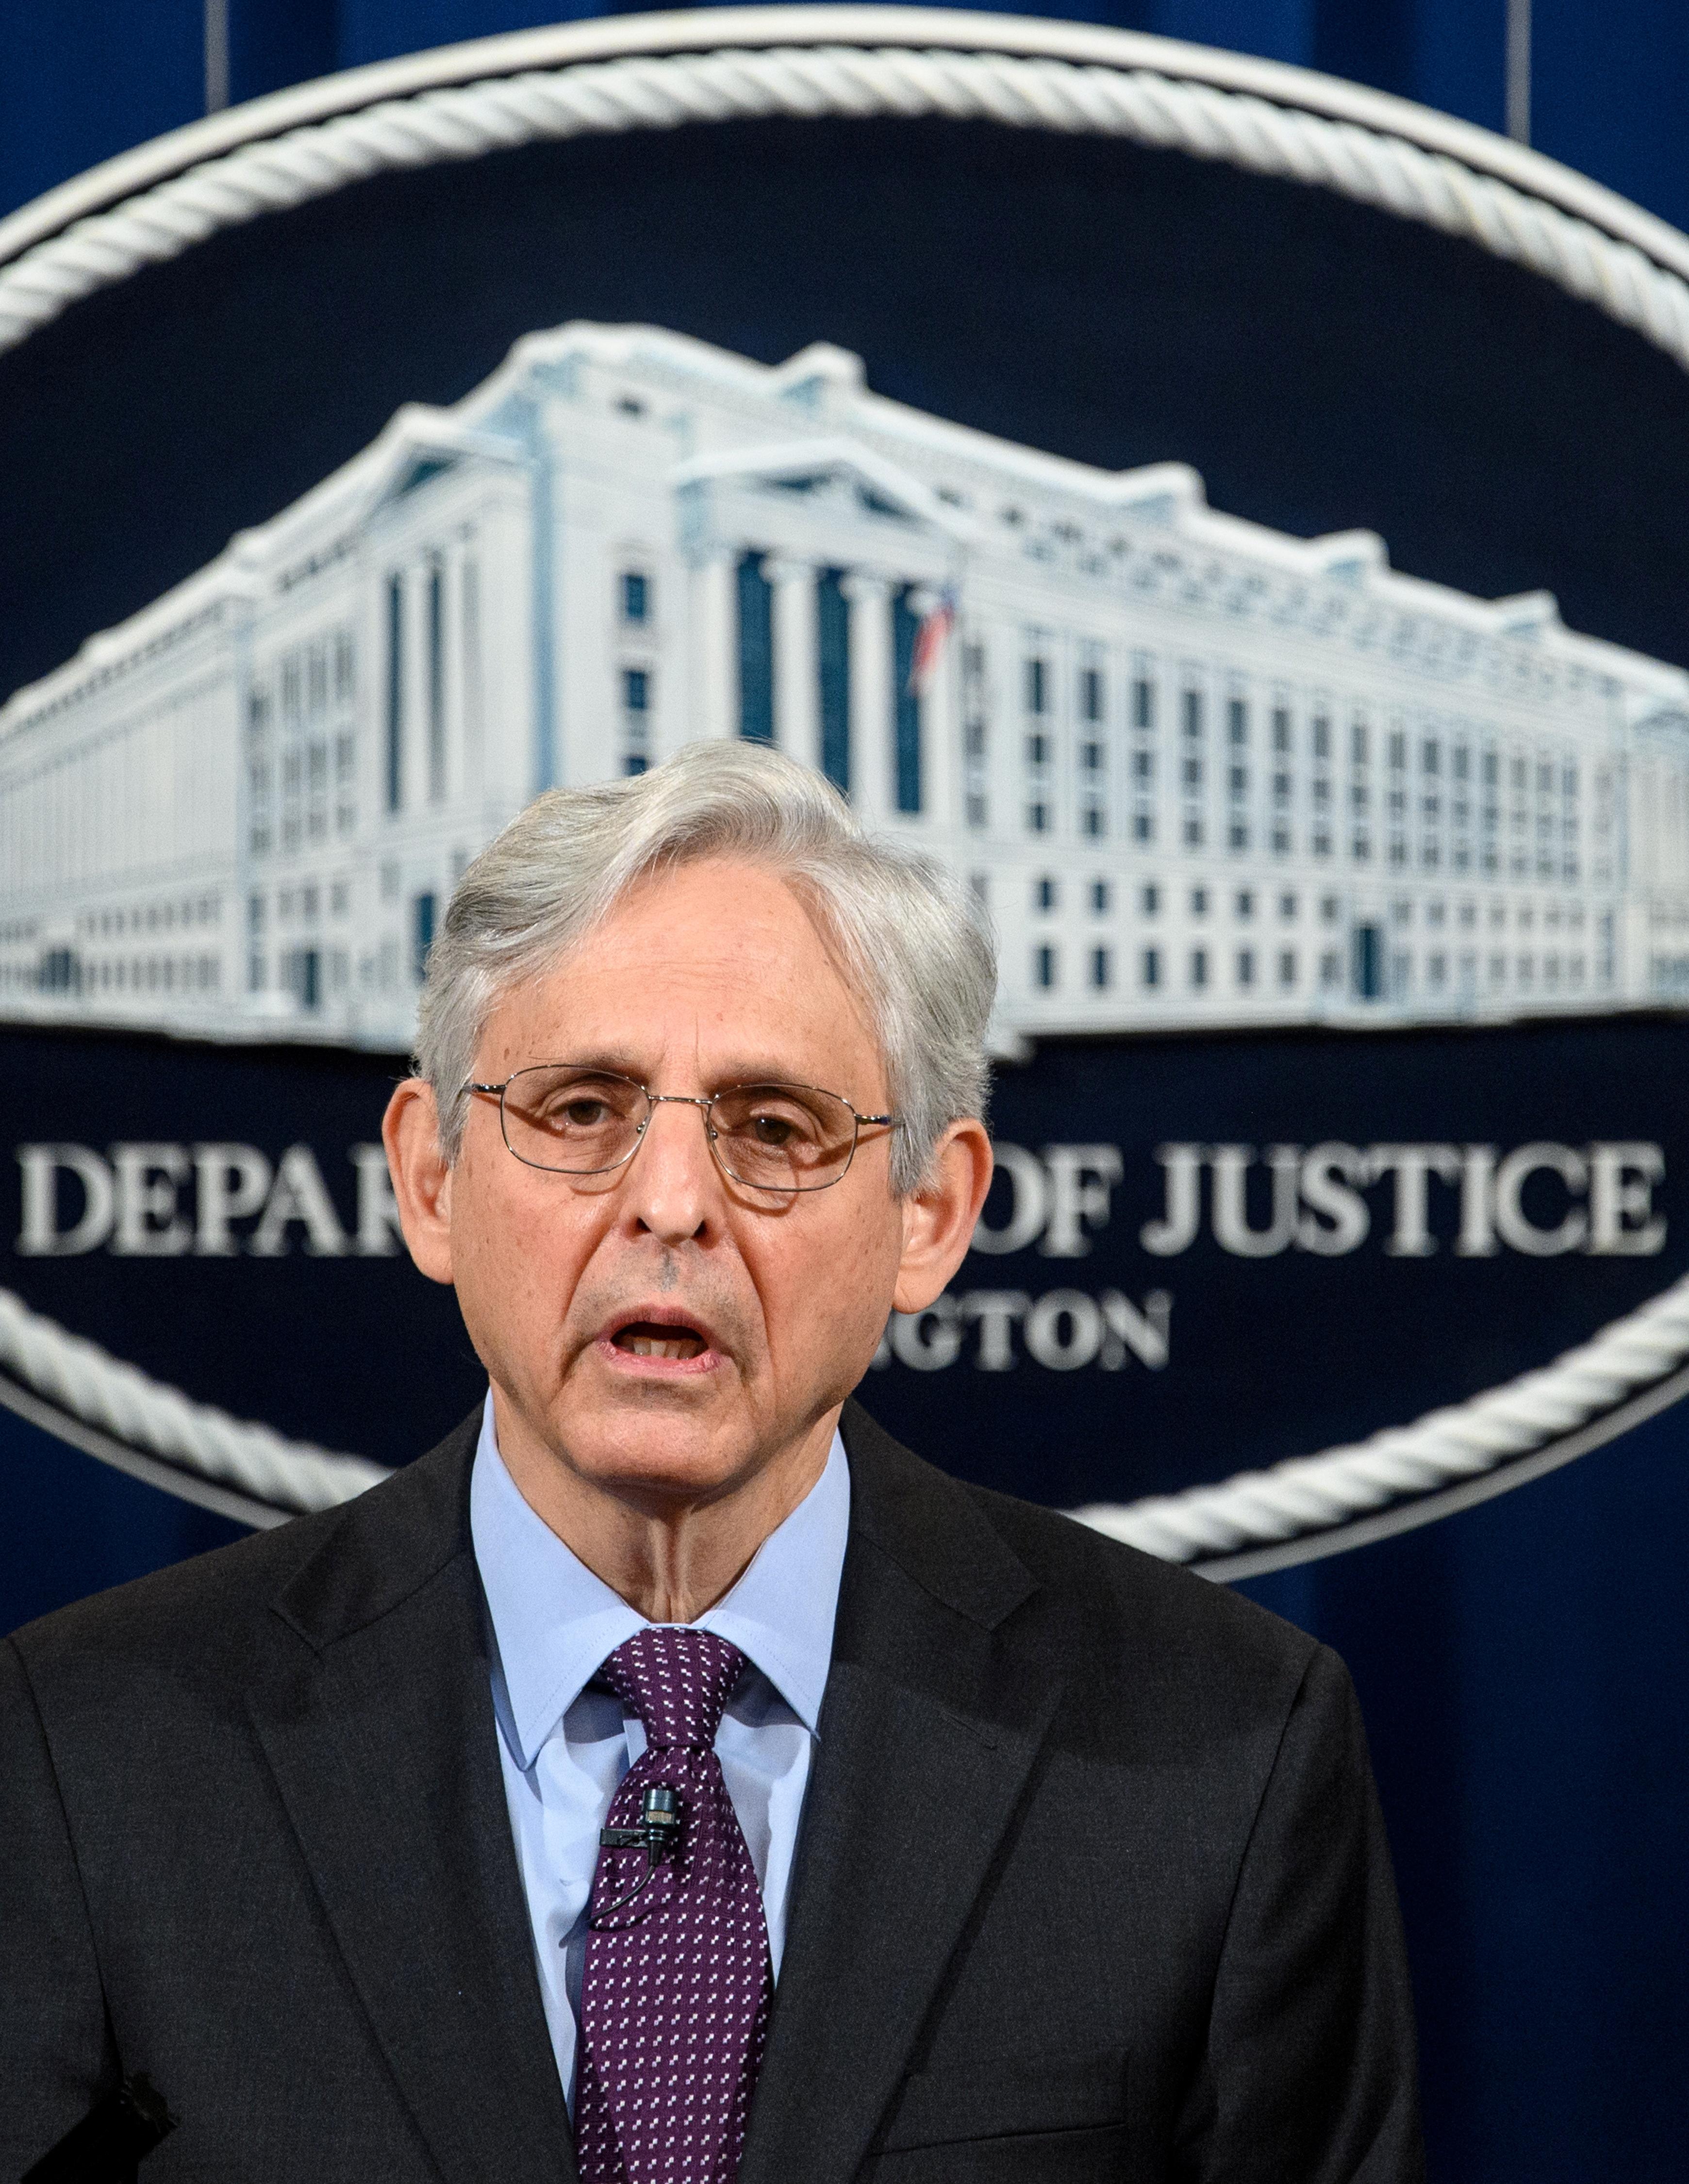 U.S. Attorney General Merrick Garland delivers a statement at the Department of Justice in Washington, U.S. April 26, 2021. Mandel Ngan/Pool via REUTERS